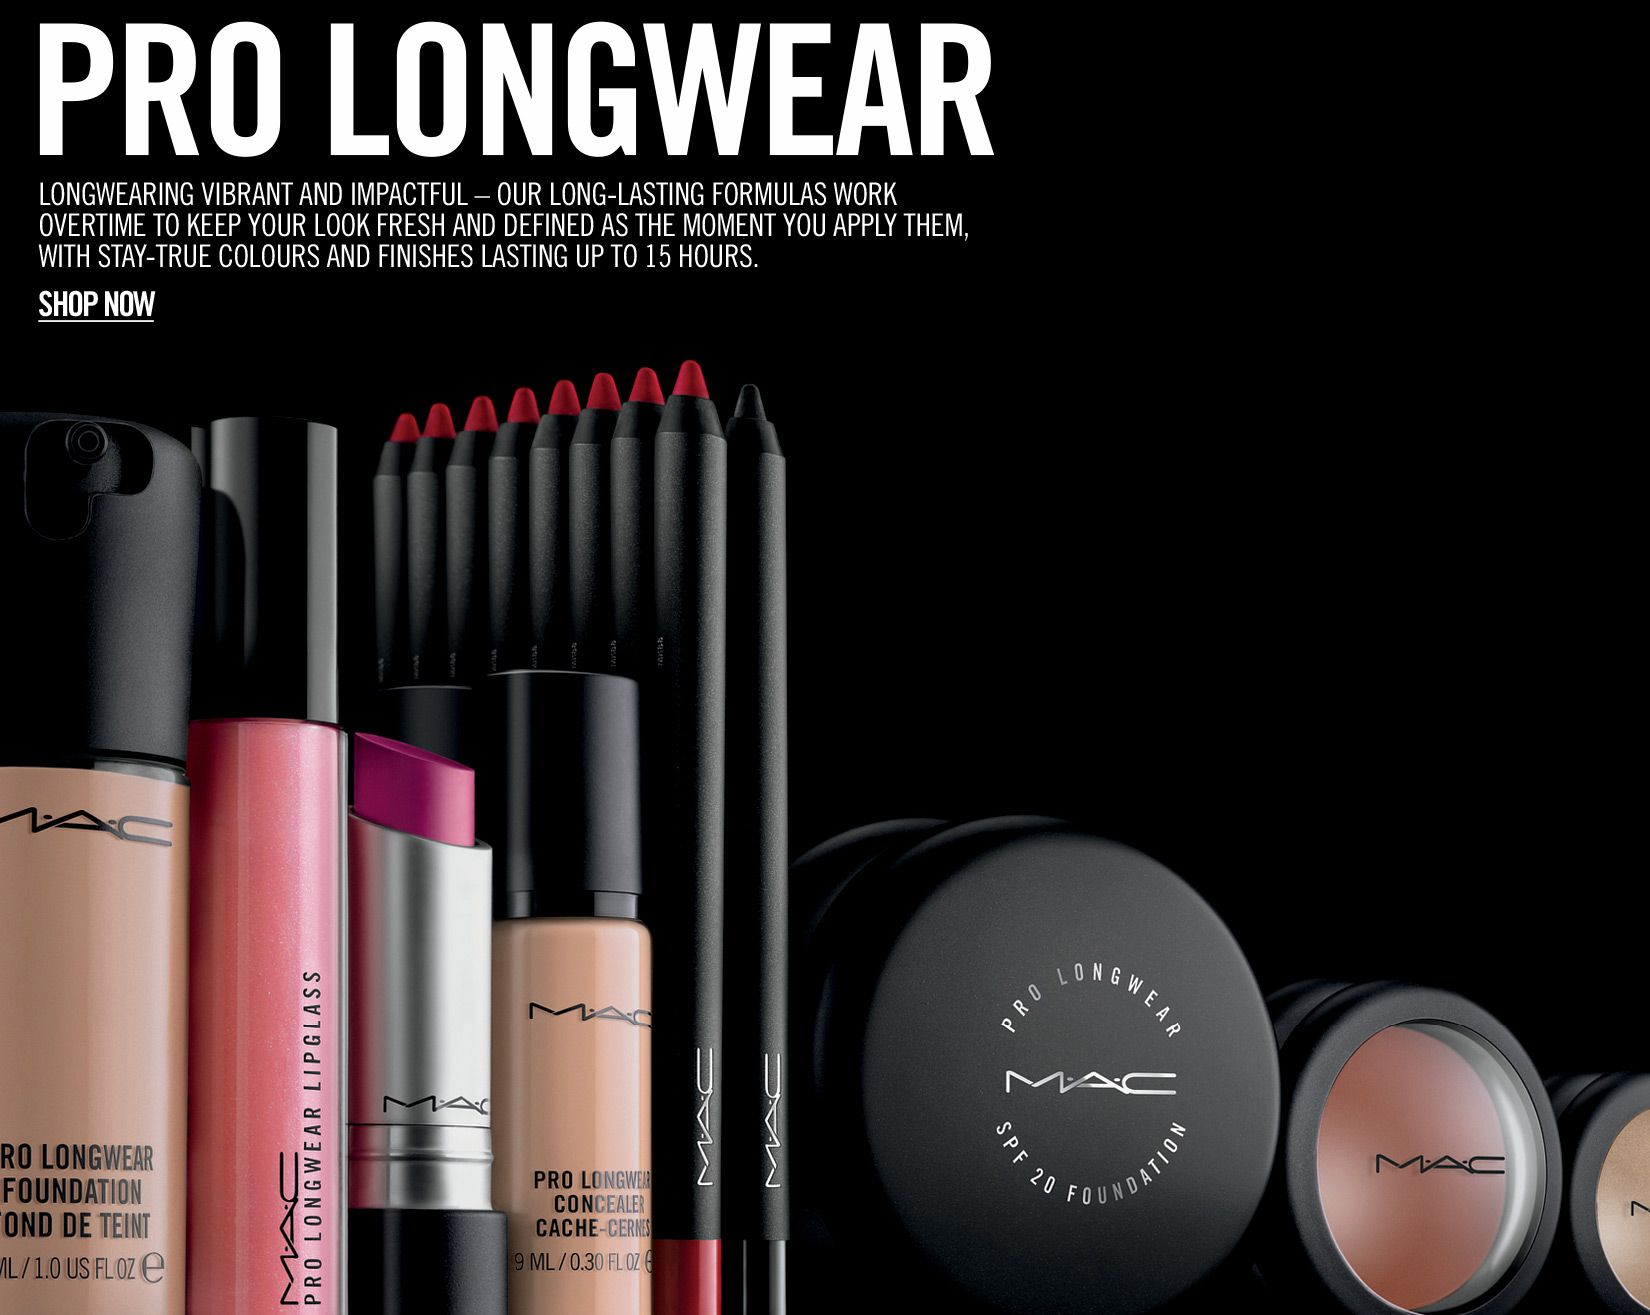 Pro Longwear Cosmetics brands, Mac makeup eyeshadow, Top